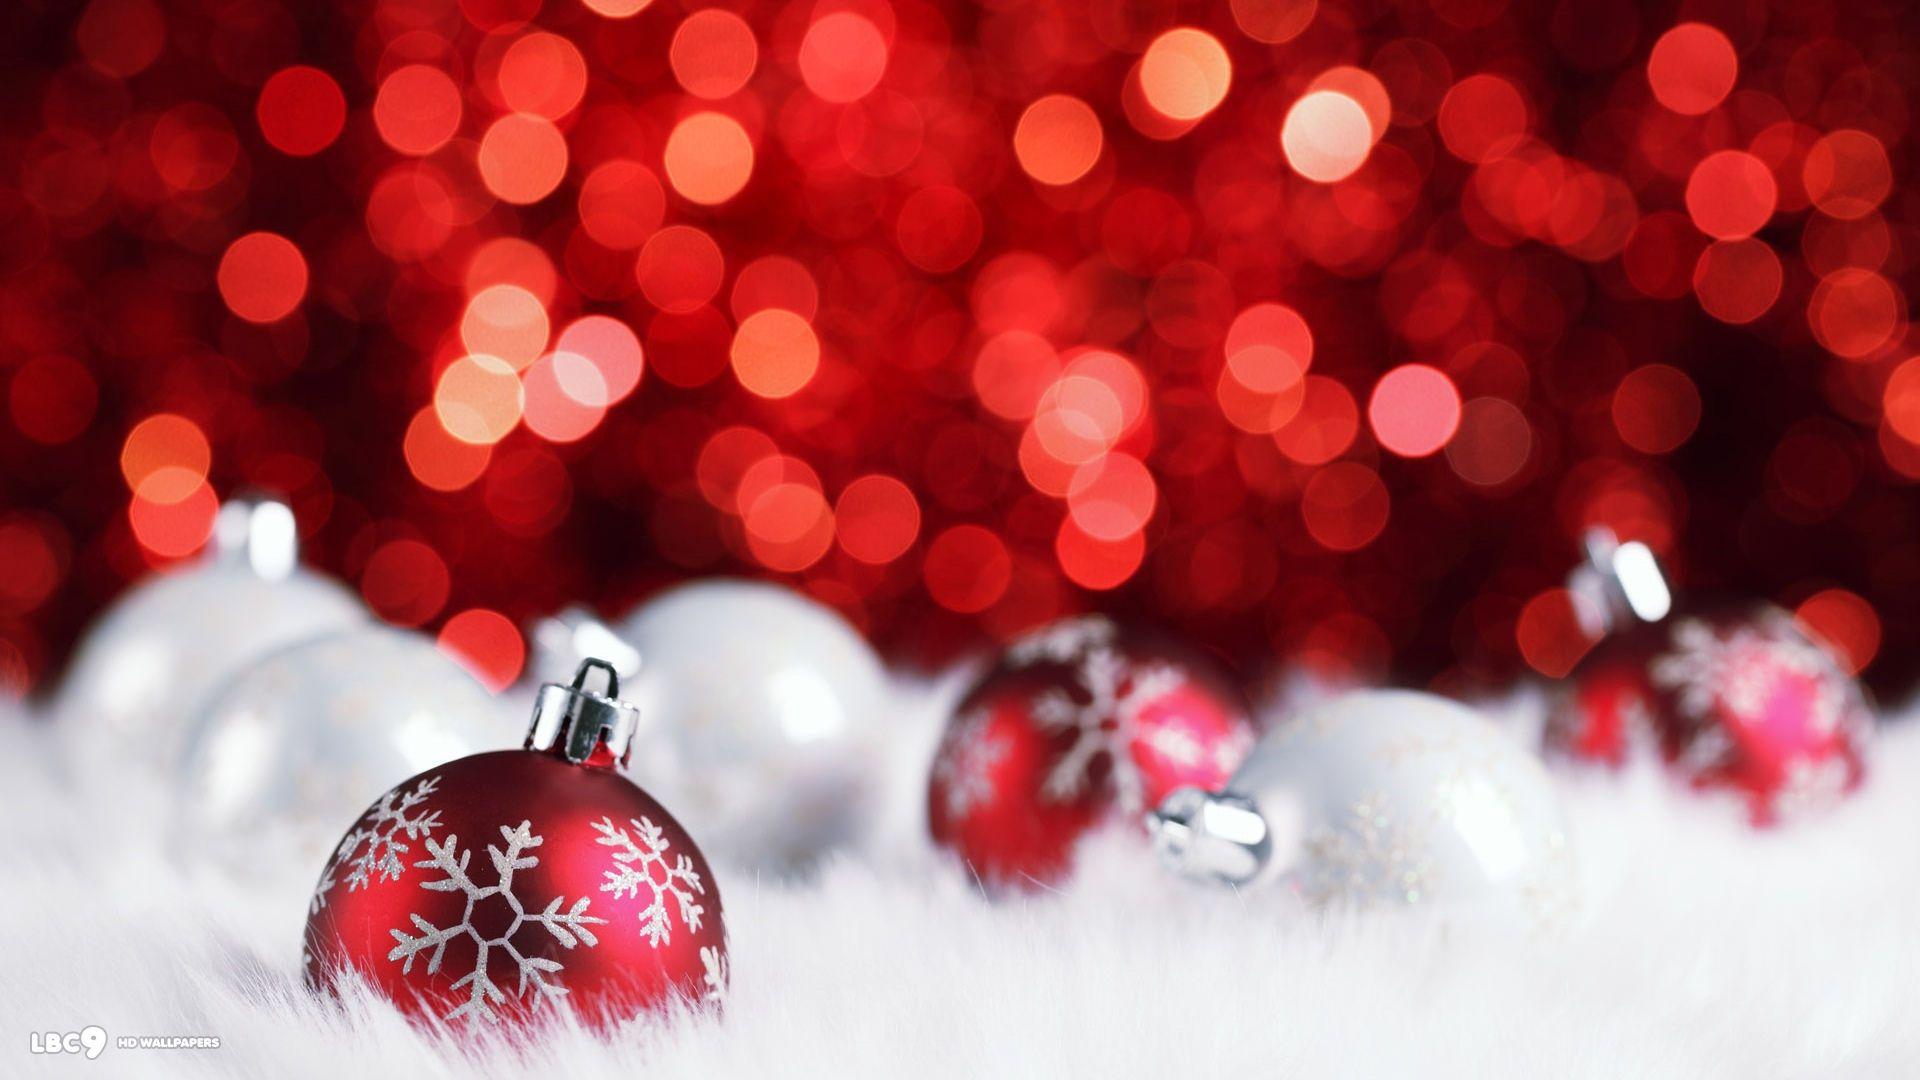 red silver christmas balls decorations bokeh holiday desktop